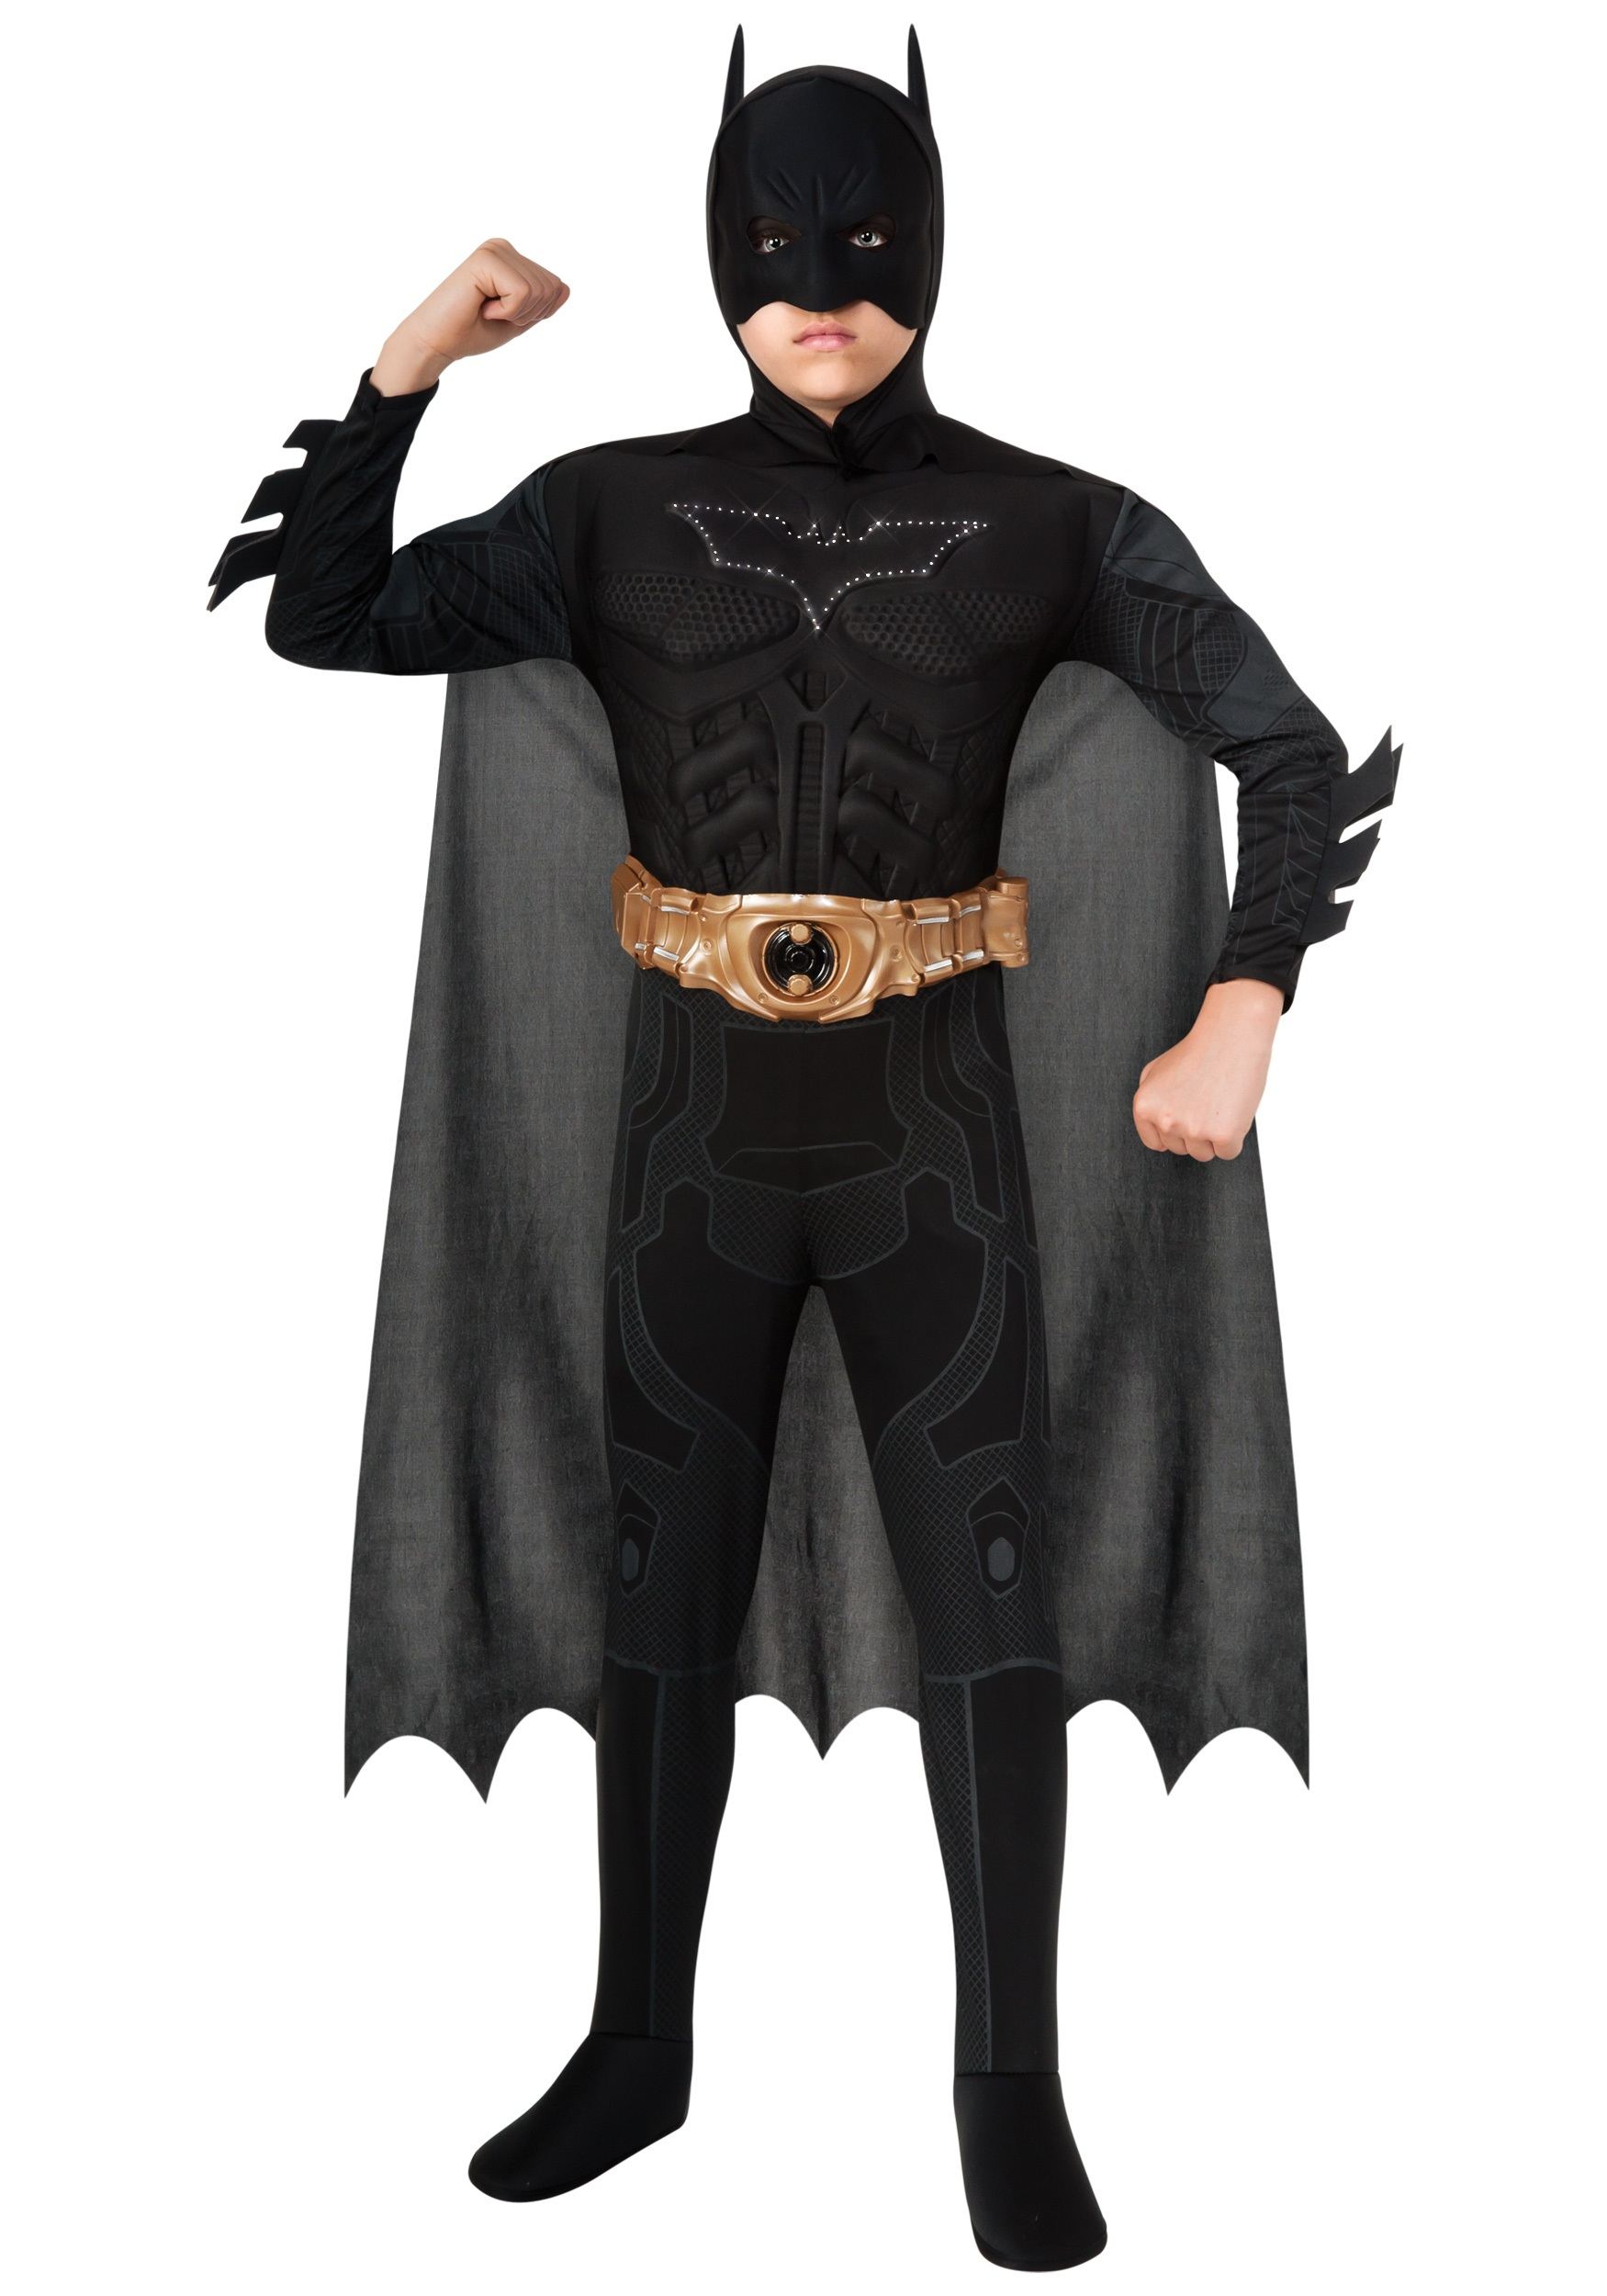 Light Up Dark Knight Rises Boys Batman Costume